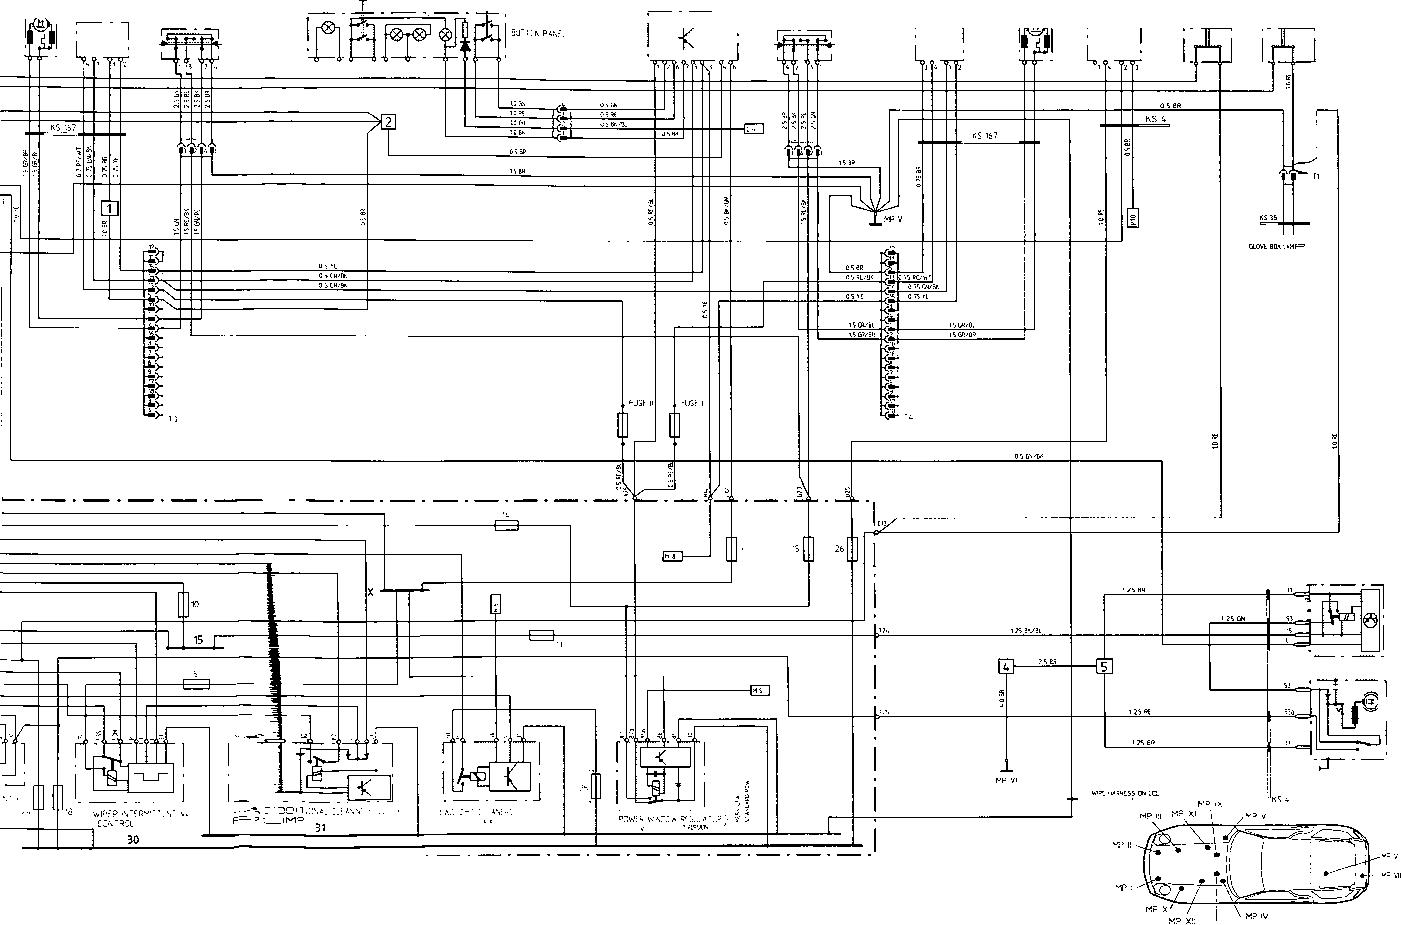 nissan diagrams   nissan elgrand e51 wiring diagram